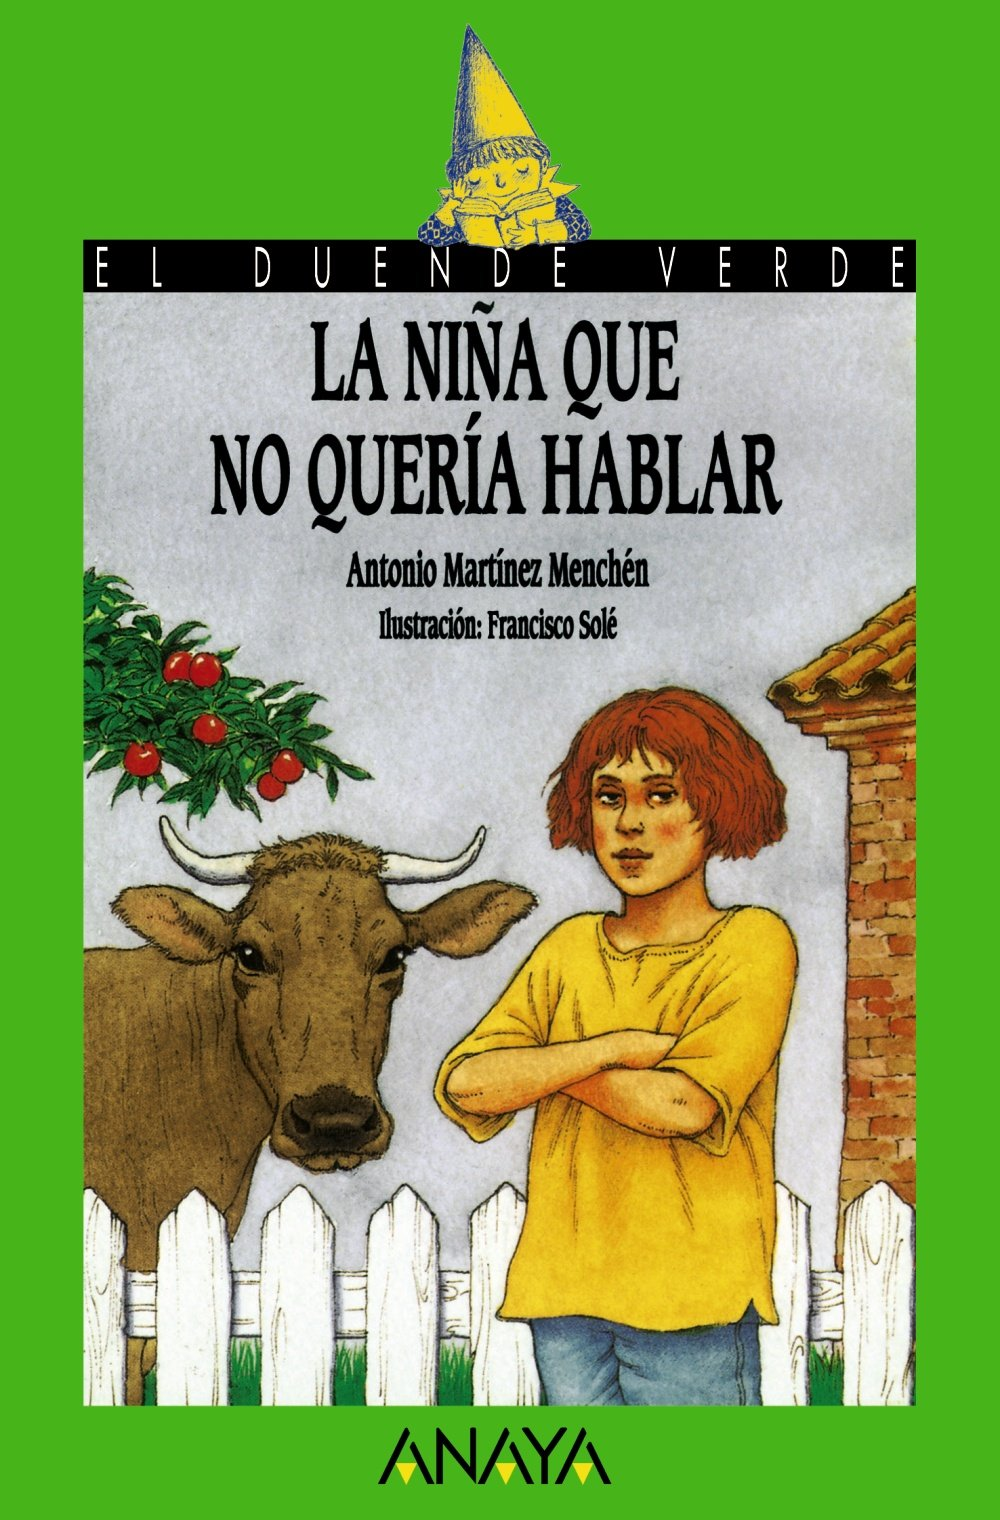 La nina que no queria hablar / The Girl who did not Want to Talk (El duende verde / The Green Elf) (Spanish Edition)